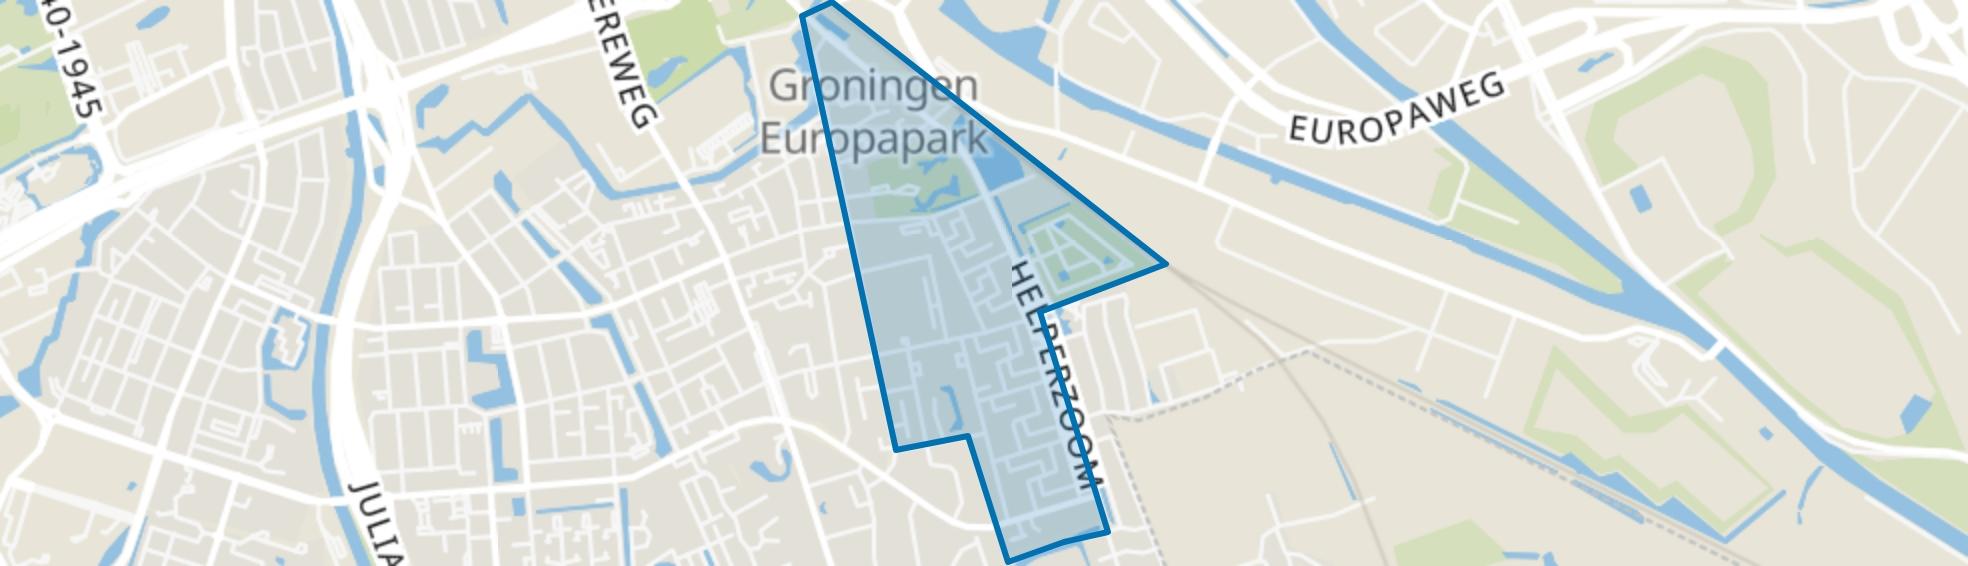 Coendersborg, Groningen map